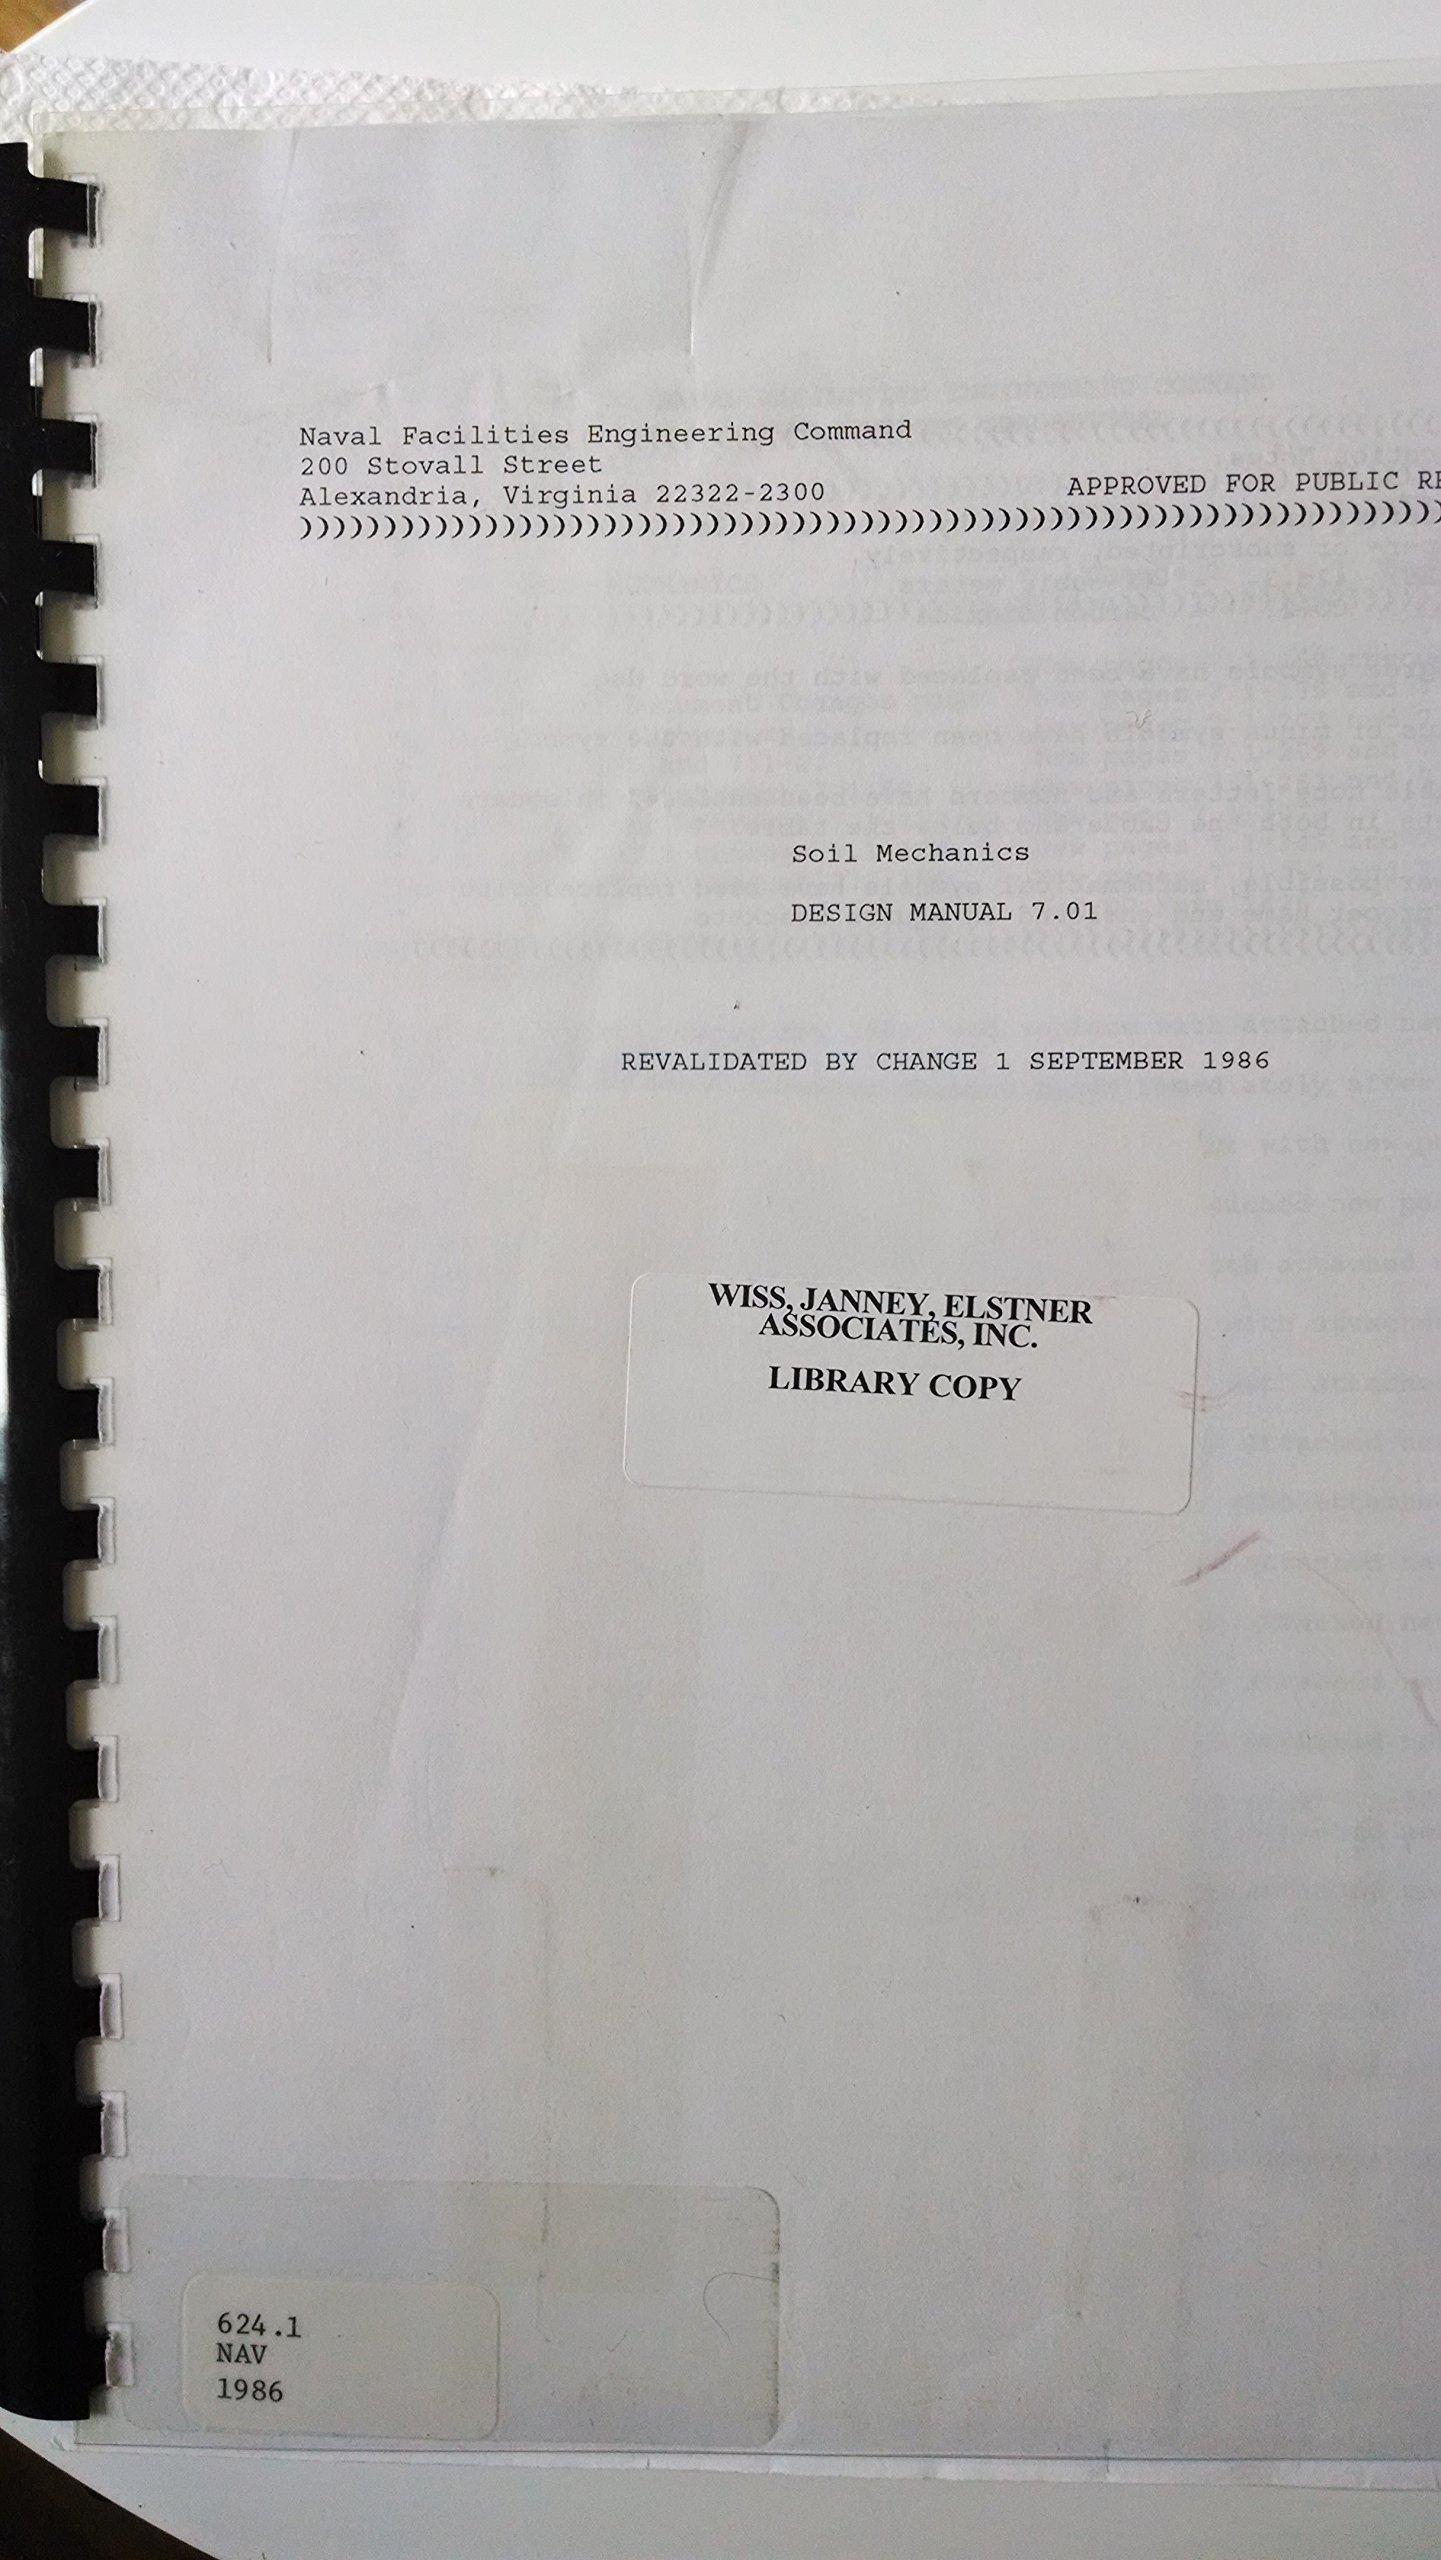 Soil Mechanics Design Manual 7.01 (Naval Facilities Engineering Command):  J. P. Jones Jr.: Amazon.com: Books